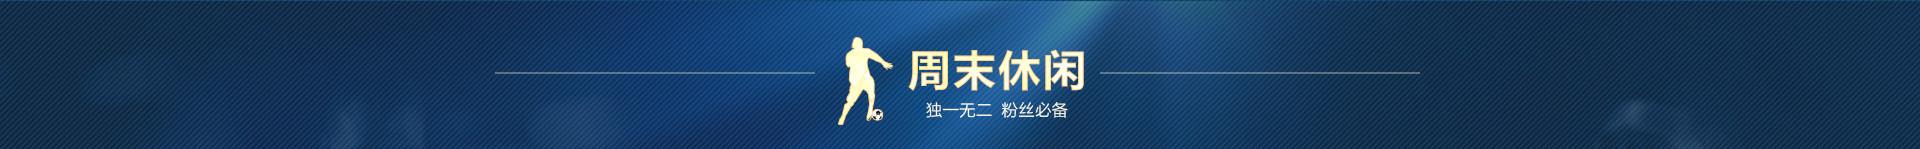 http://image.suning.cn/uimg/sop/commodity/182425451814680050474382_x.jpg